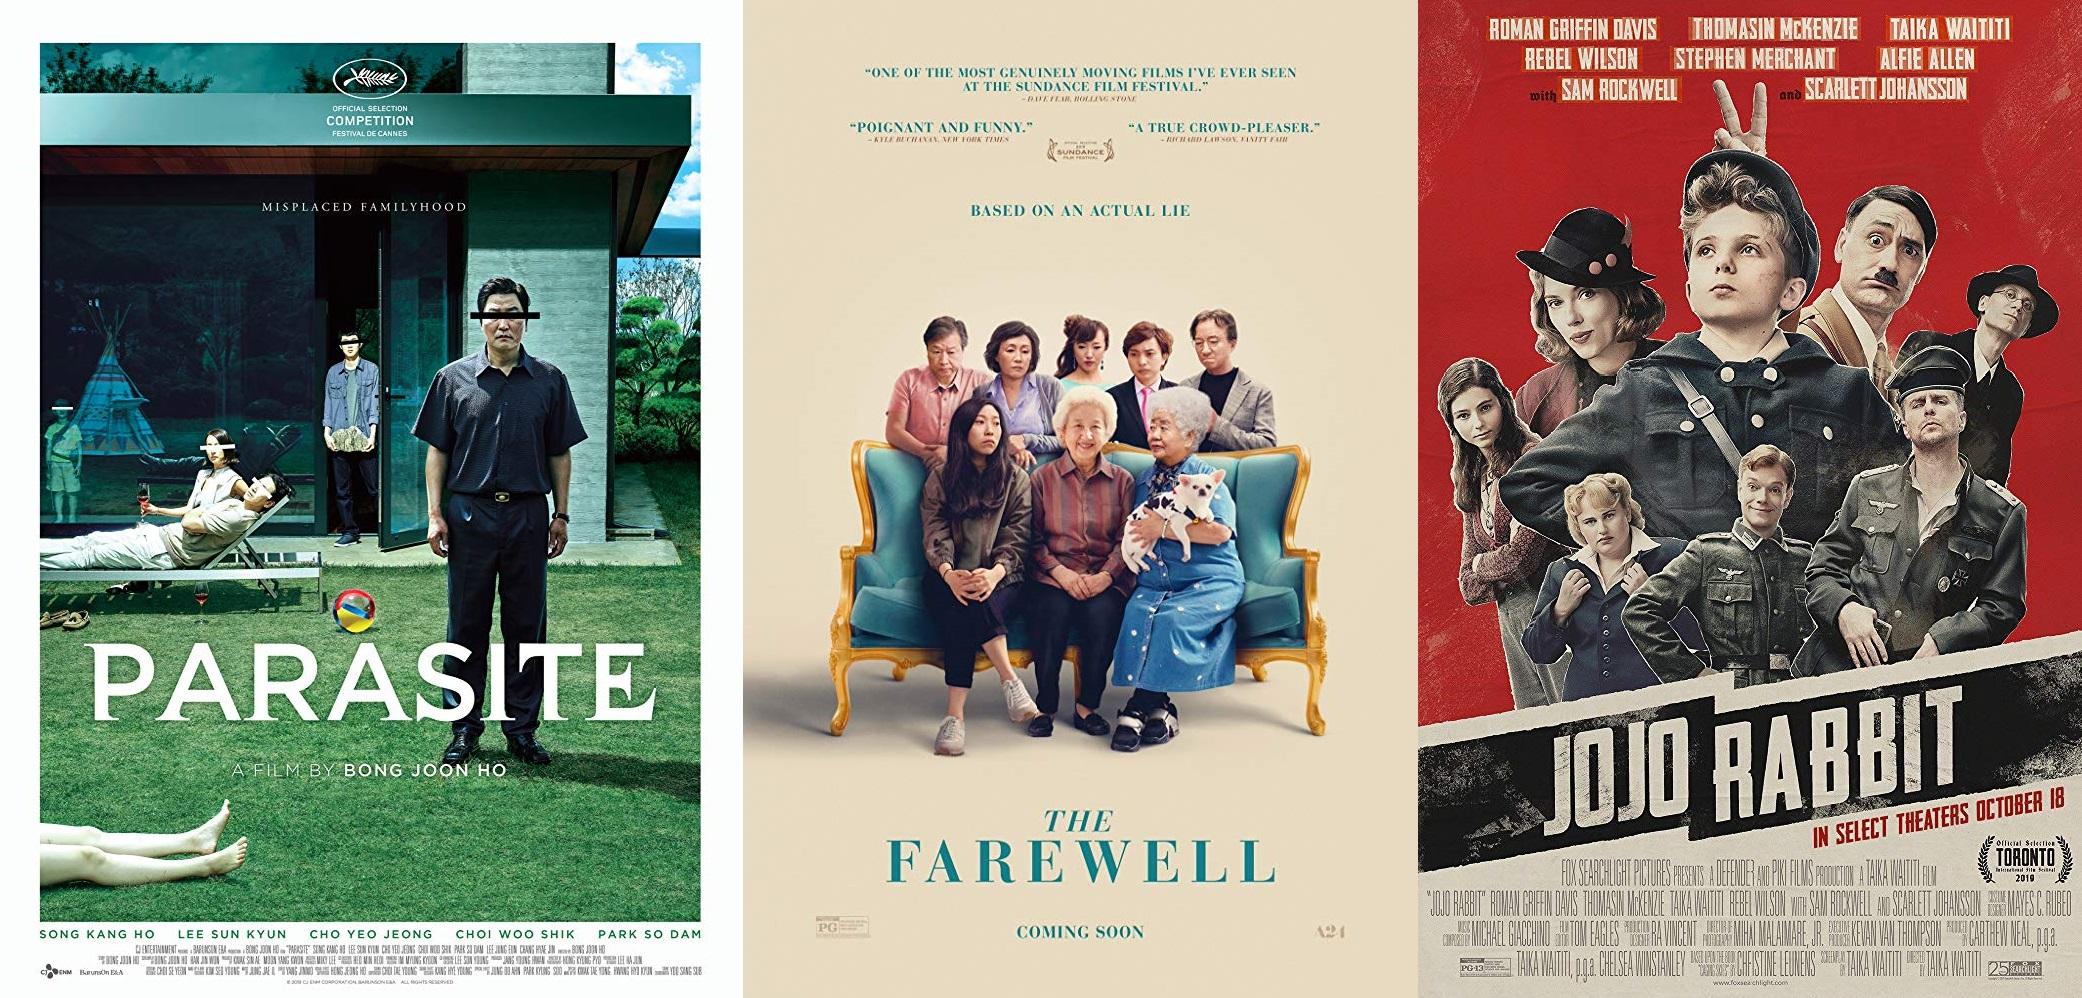 posters de parasite, the farewell y jojo rabbit